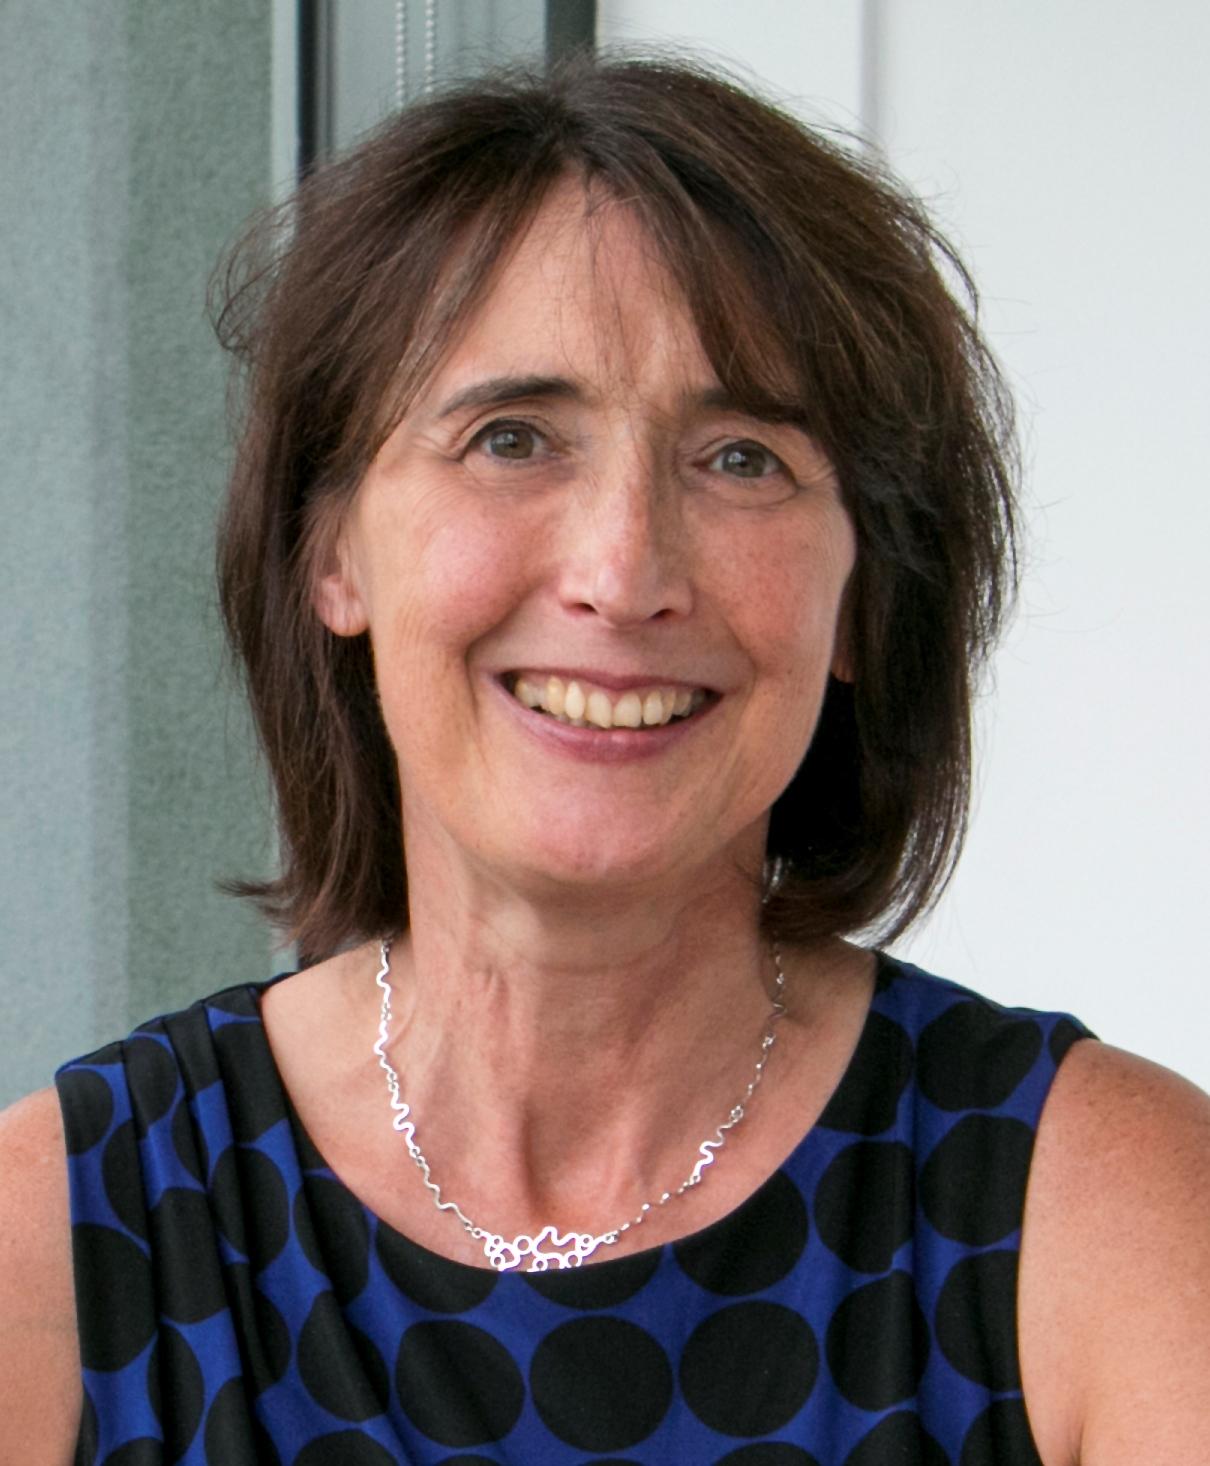 Joy Dunlop - Managing Director